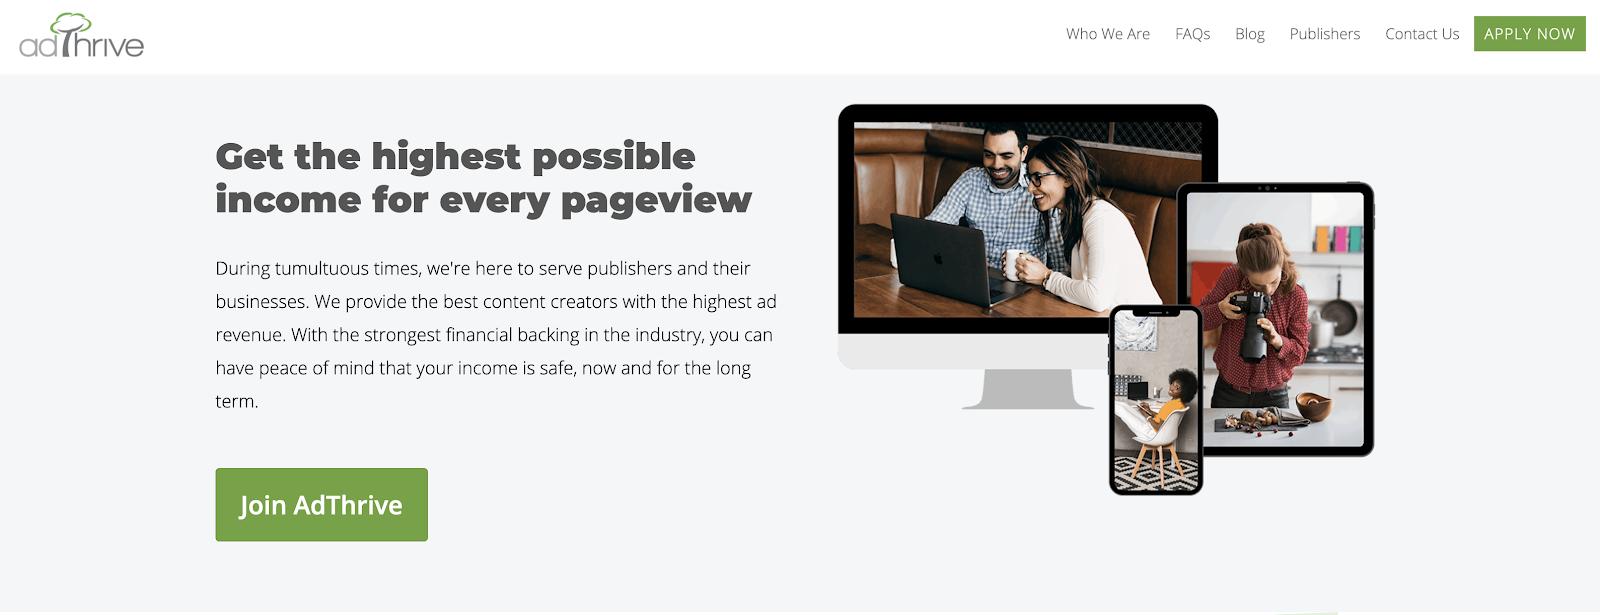 AdThrive Blog Ads Network (Homepage Screenshot)